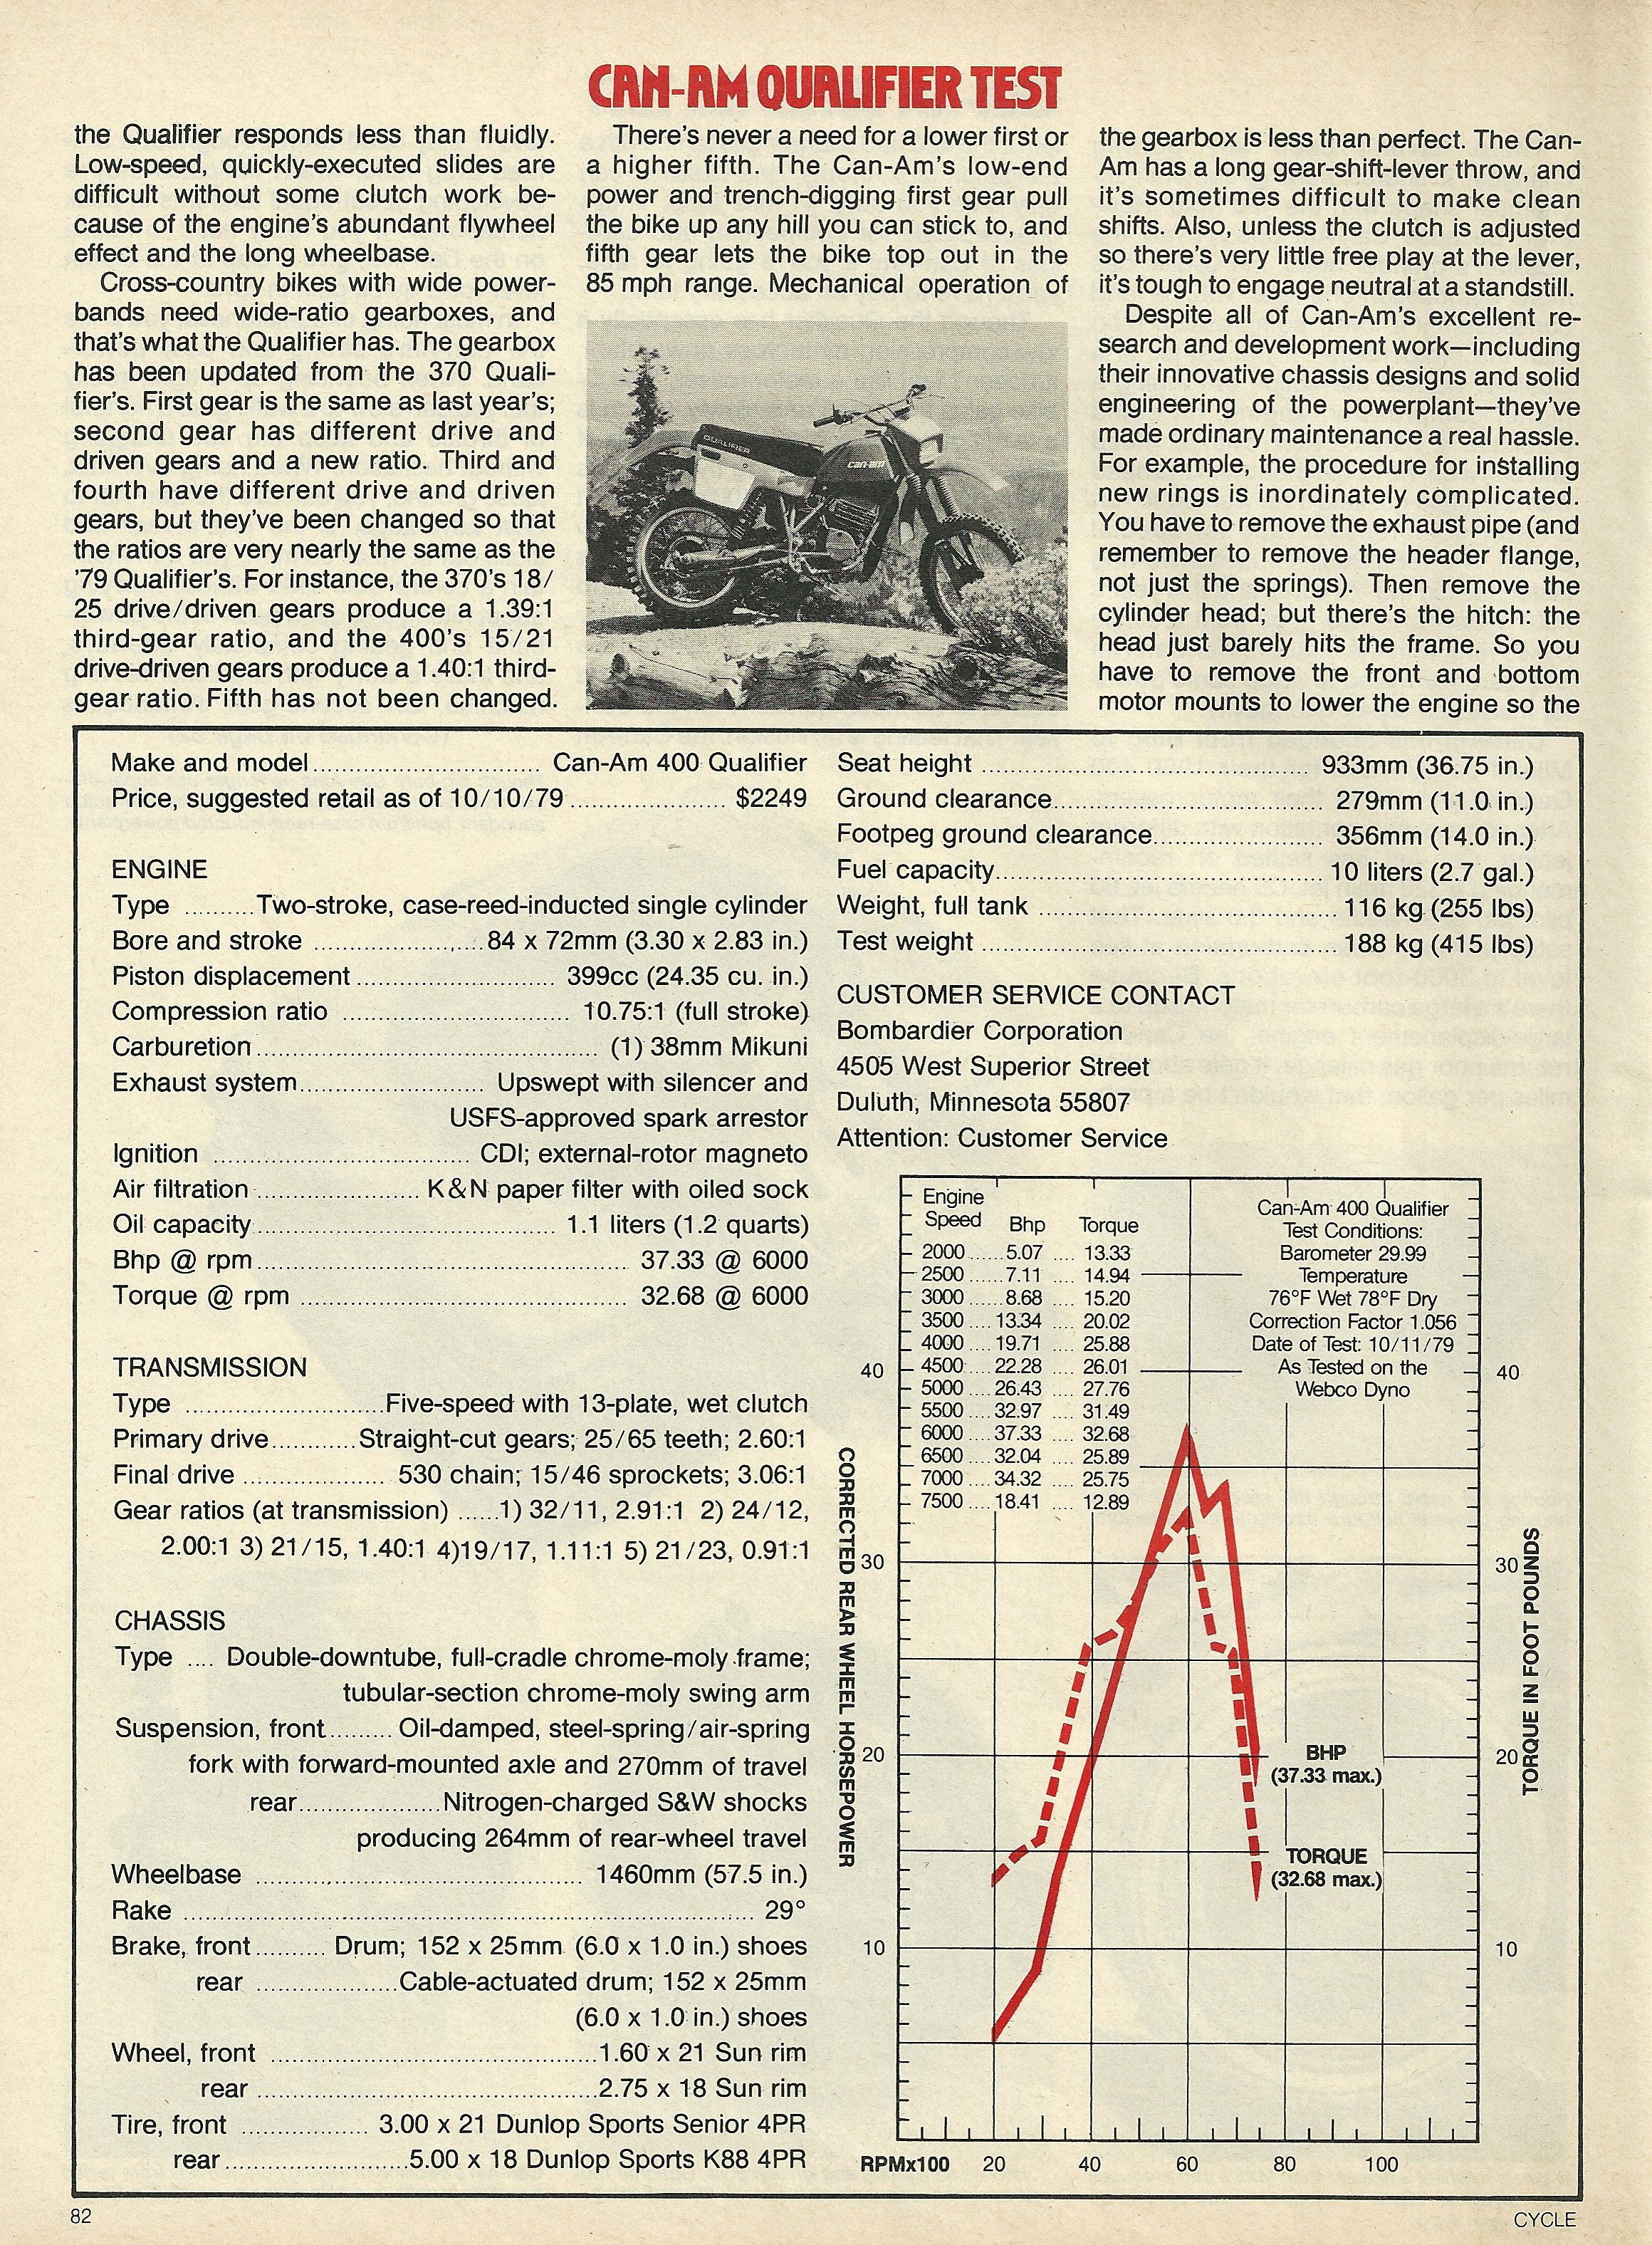 1980 Can-Am 400 Qualifier off road test 6.JPG